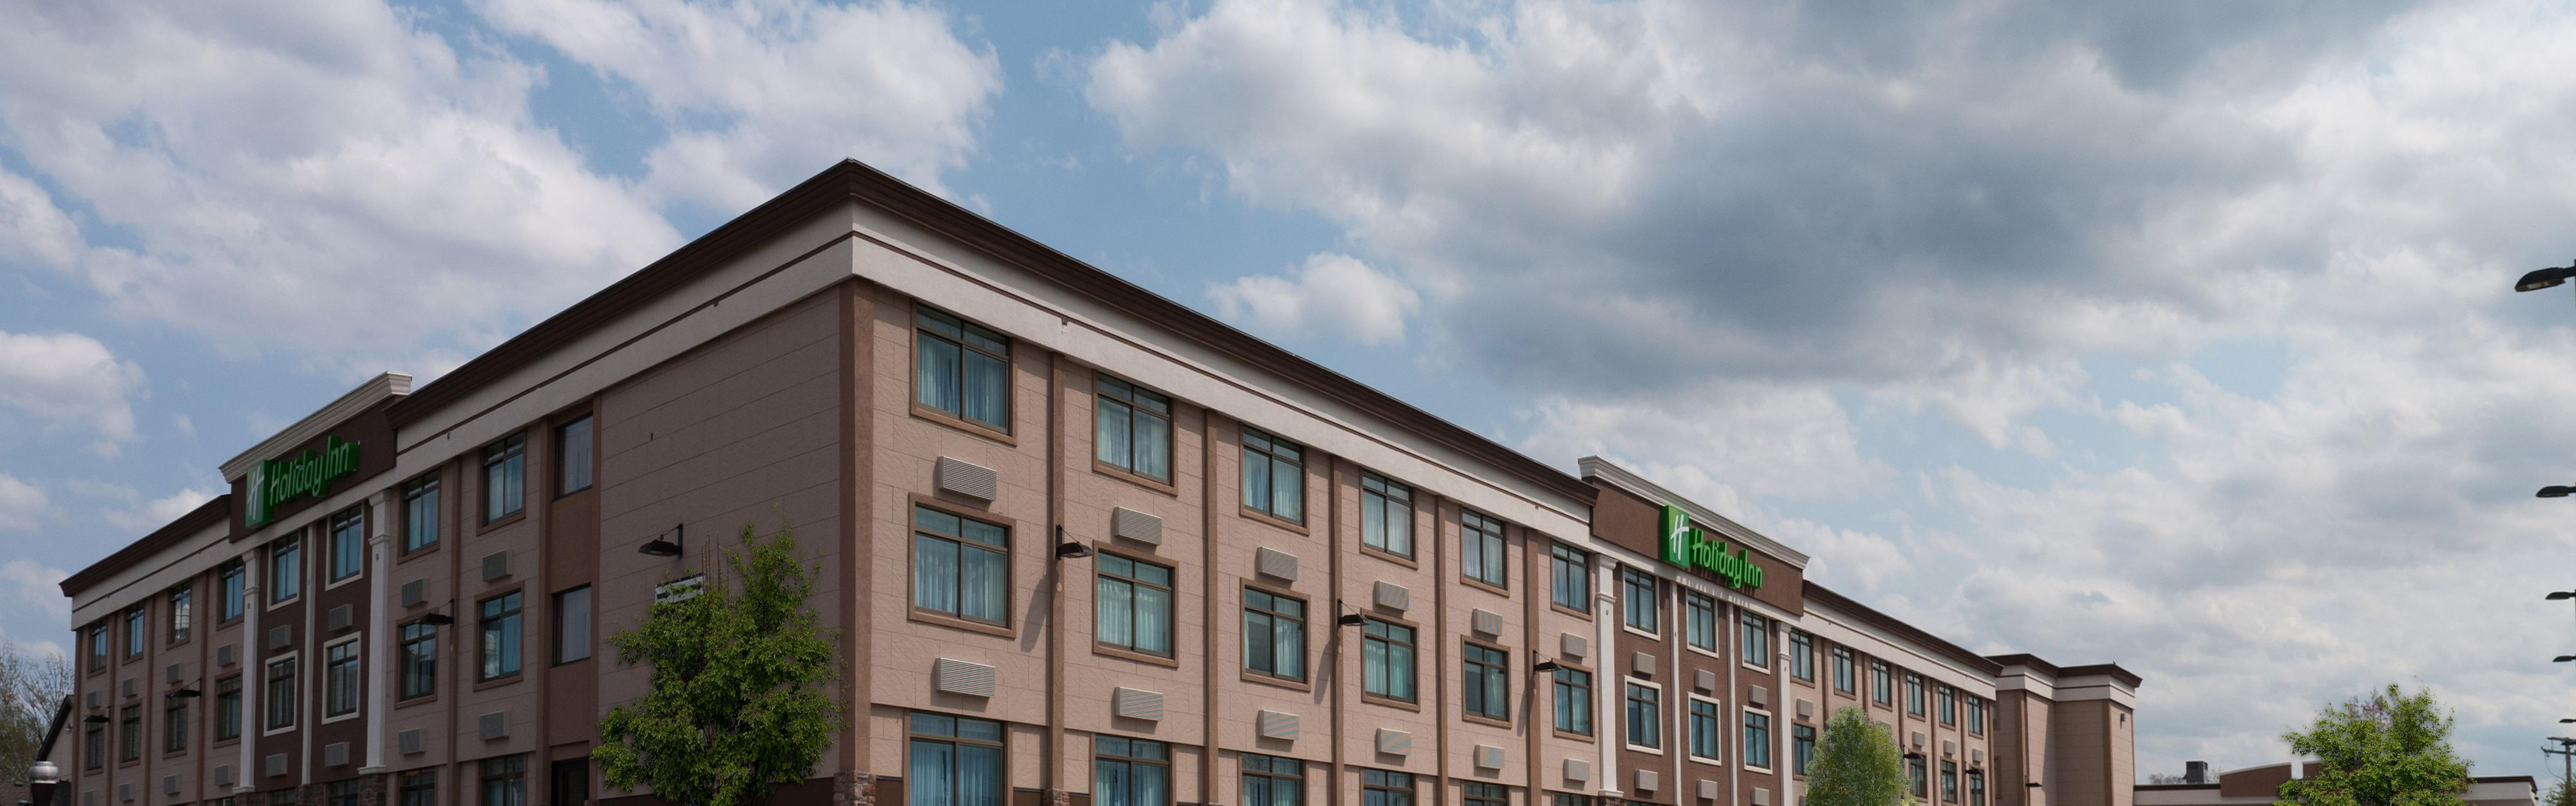 Holiday Inn Mount Prospect - Chicago image 0